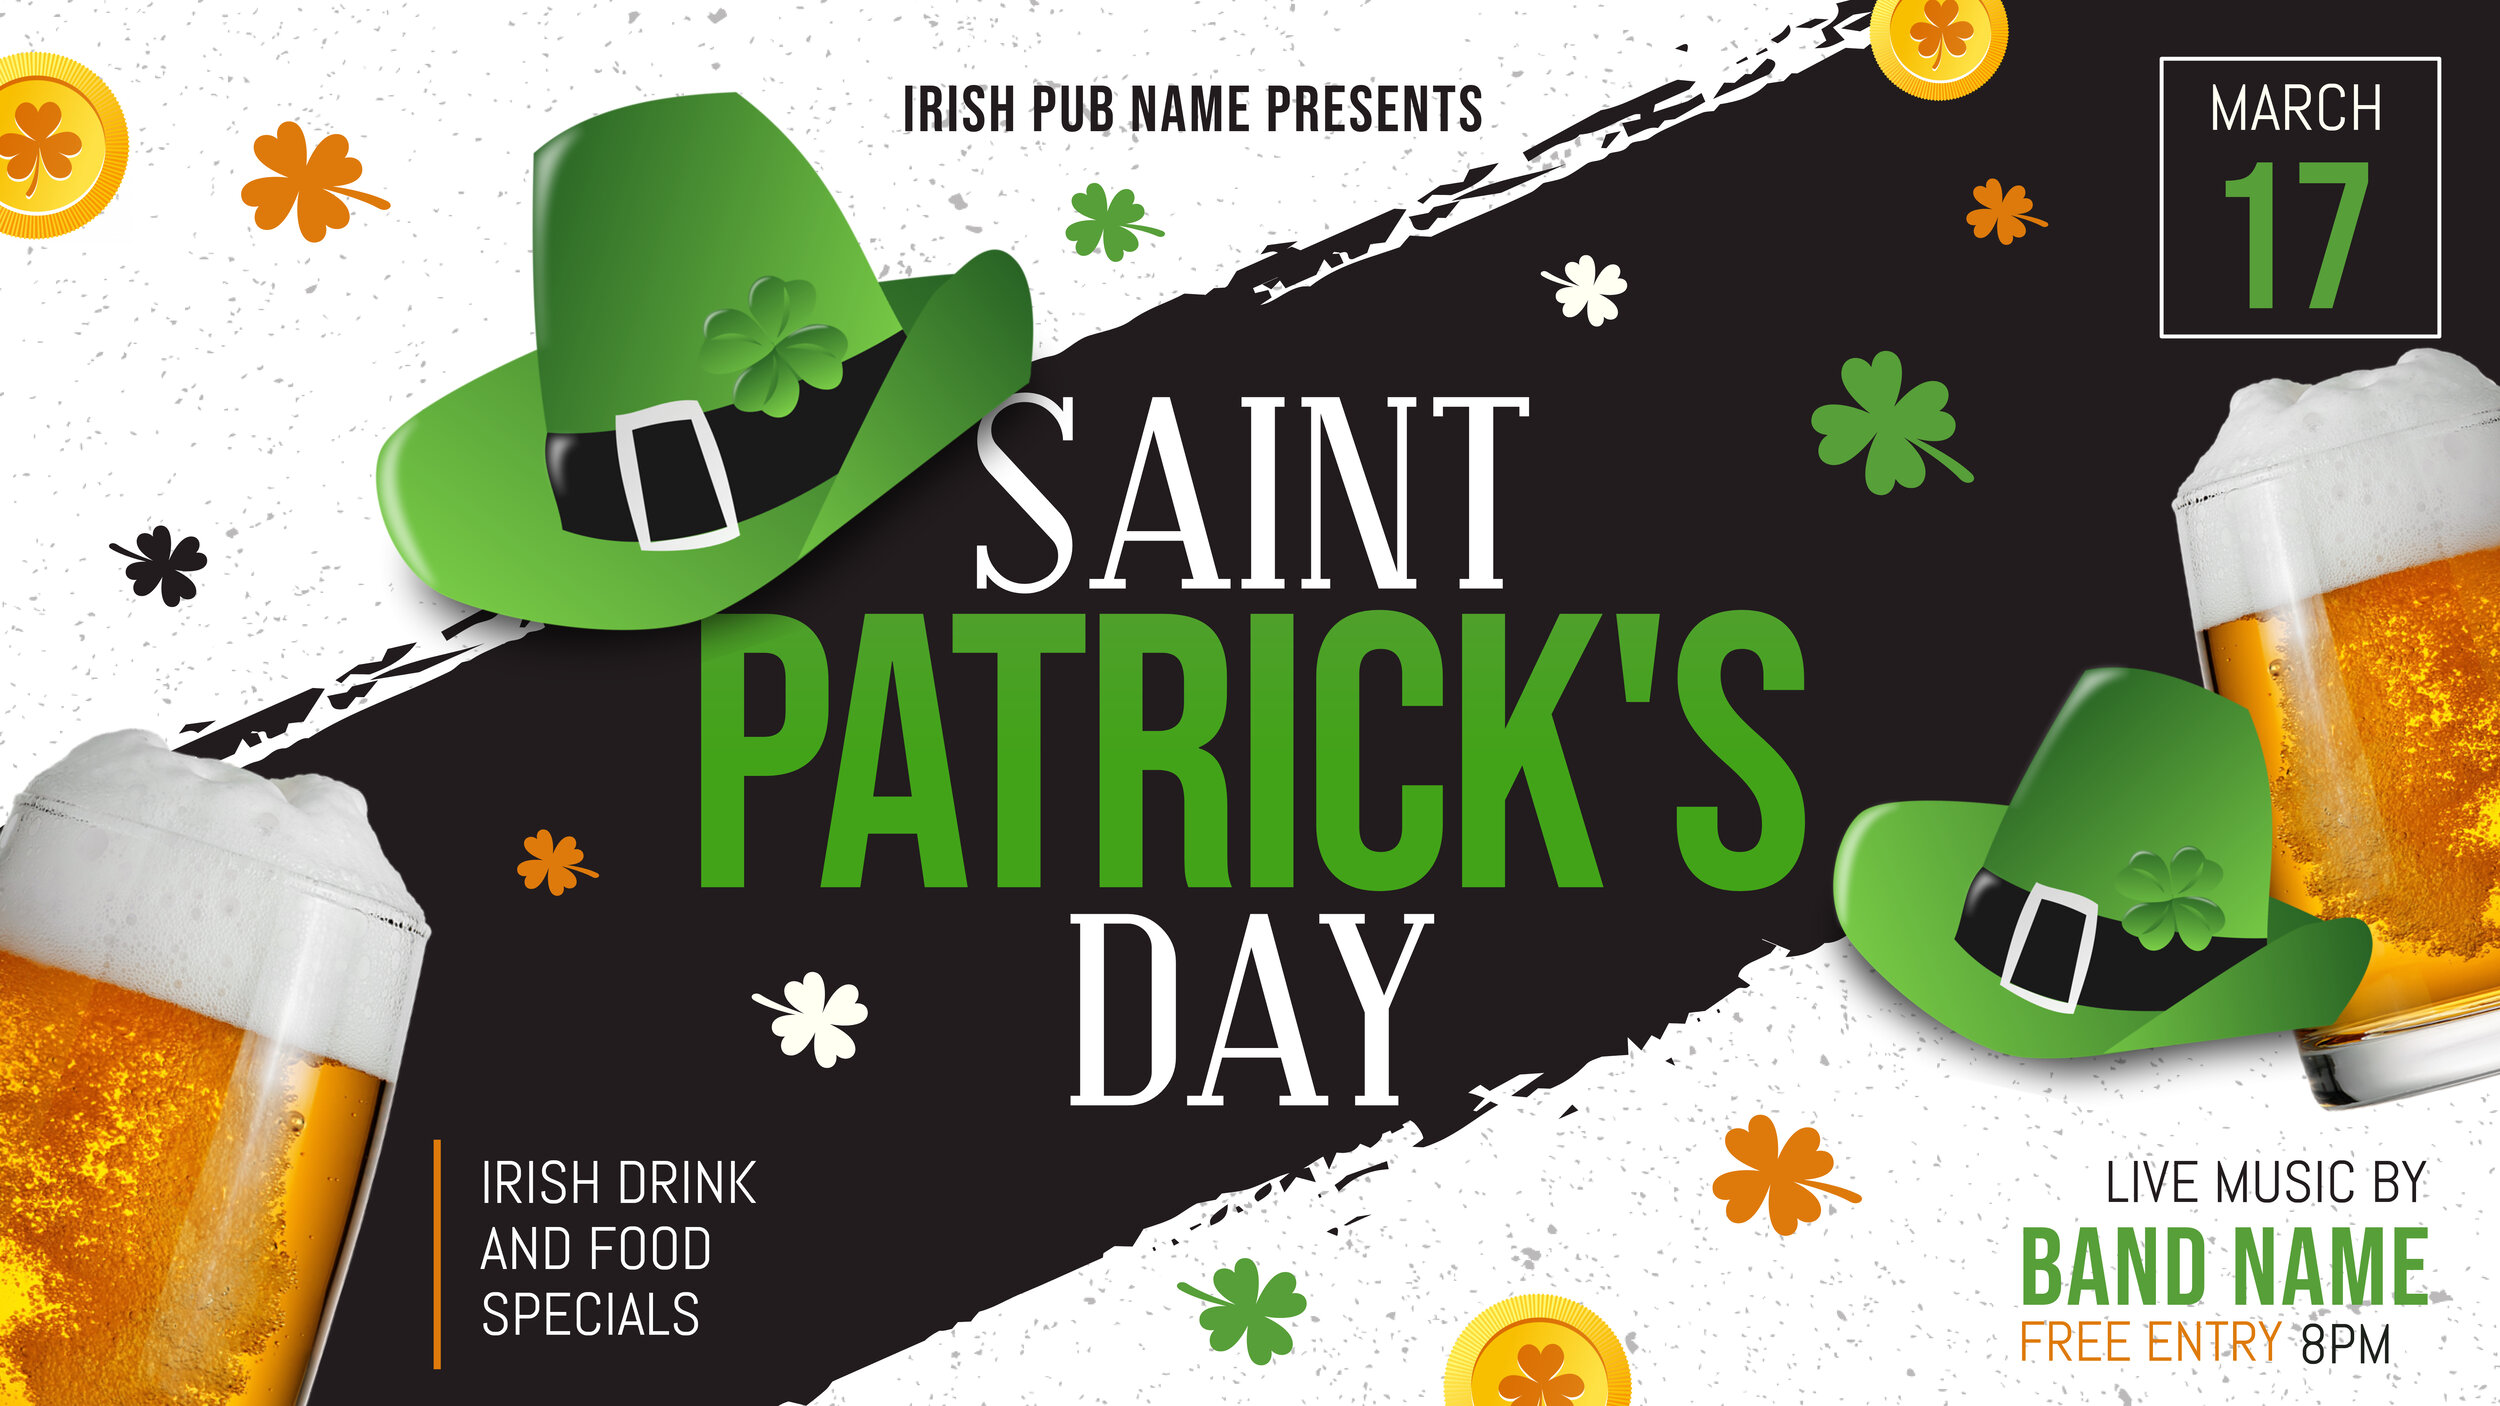 Green Saint Patricks Day Digital Display Pub Ad Image.jpg